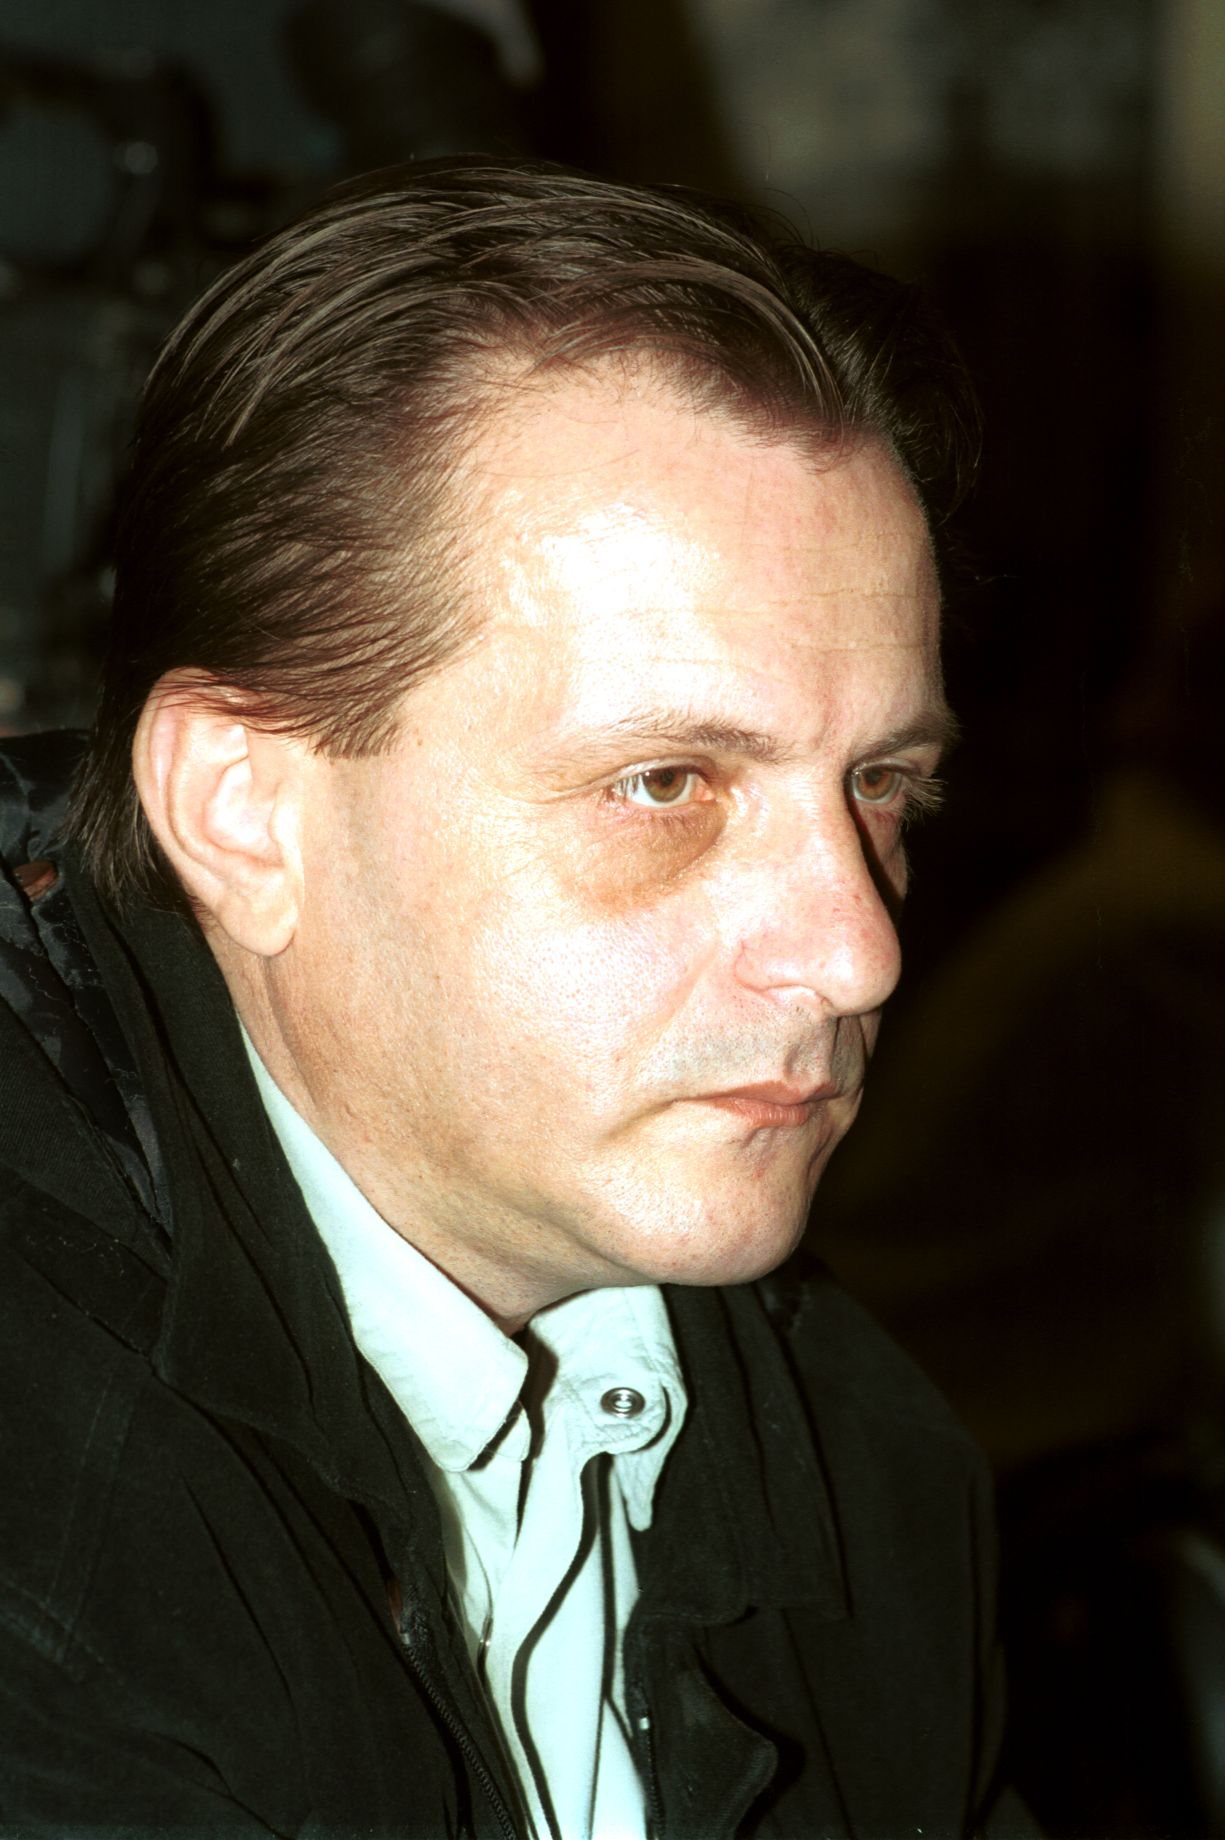 Victor Ioan Frunză